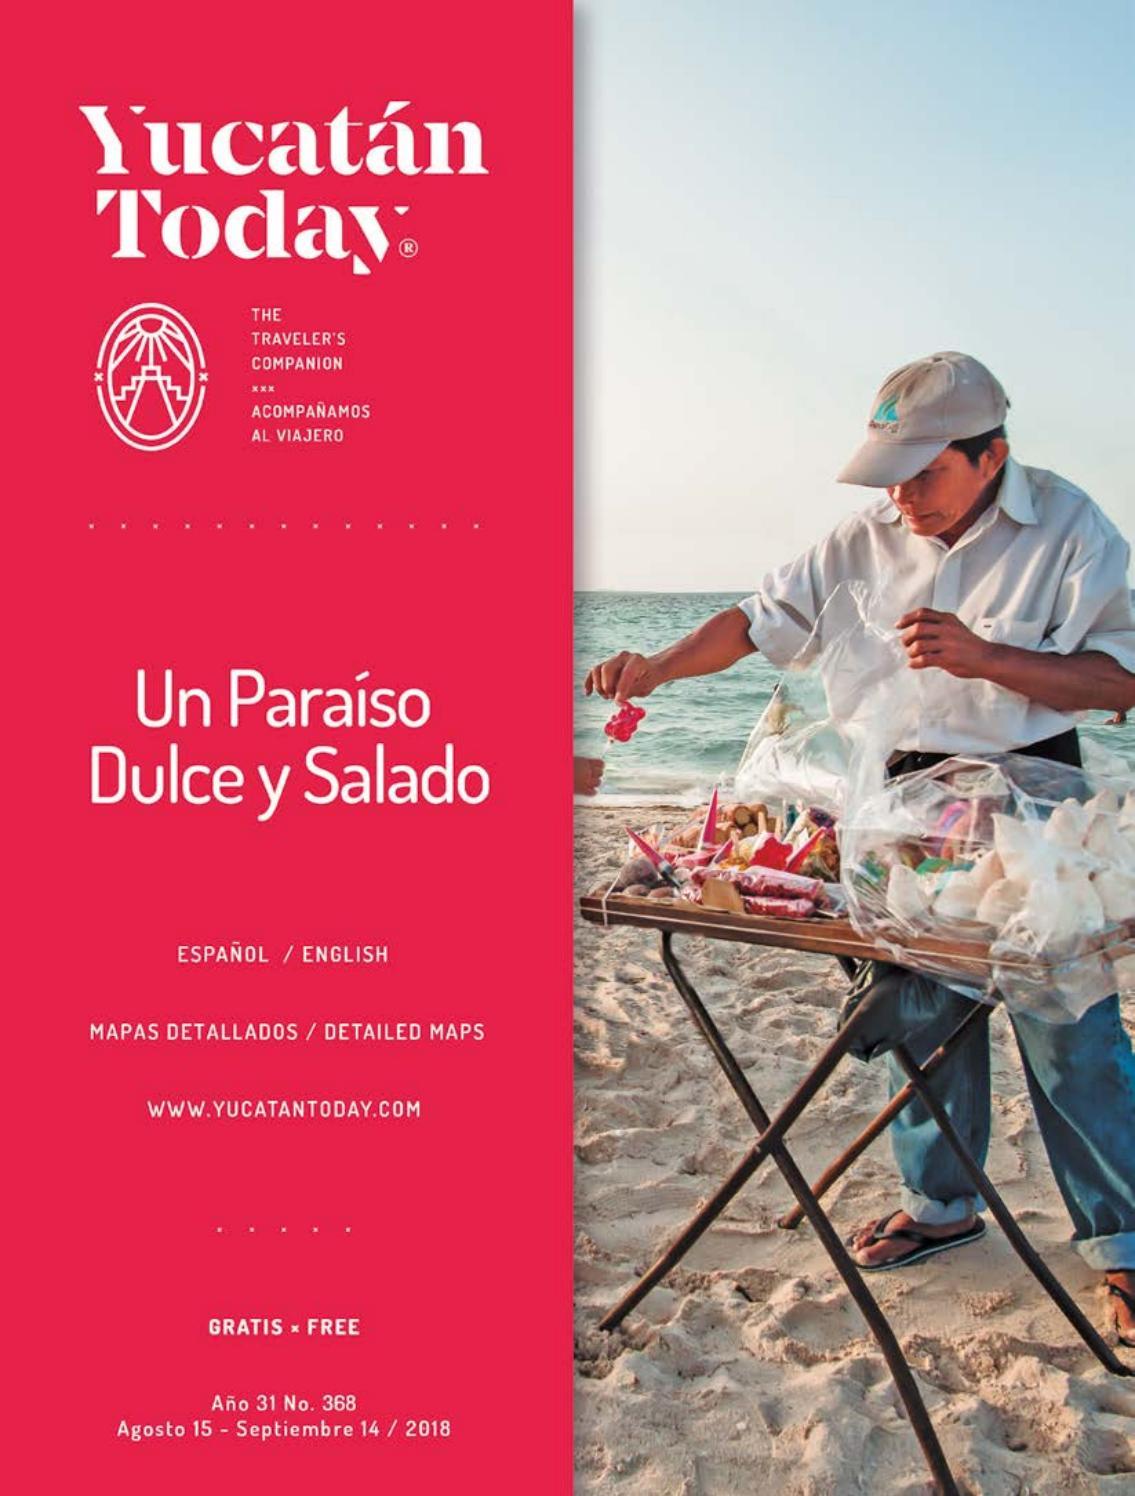 Issuu 142018 Ago By 15 Sep Today Yucatan 4q3RLj5A